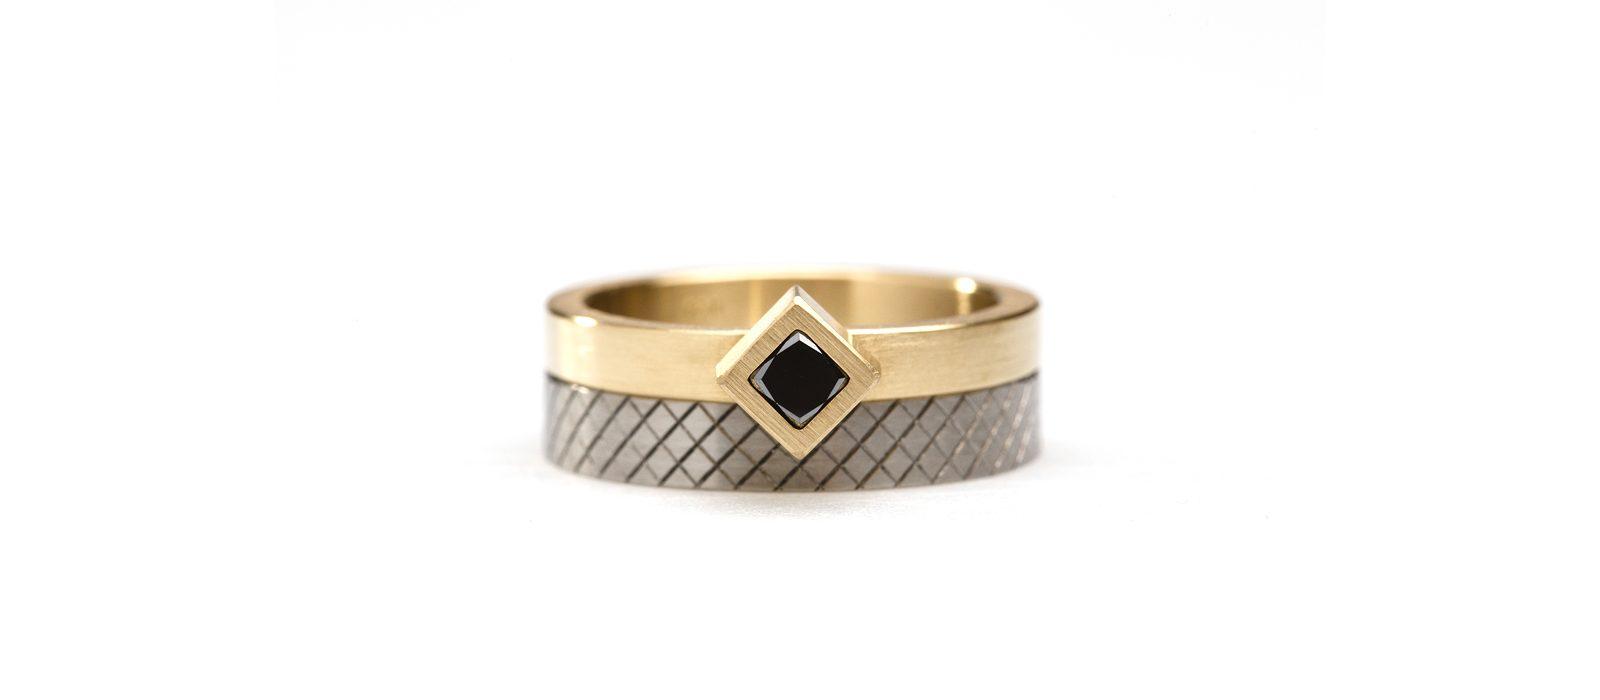 Phoebe Porter, Angled Cubist and Cross Cut ring, 2018. 750 yellow gold, black diamond, titanium. Photo: Andrew Sikorski